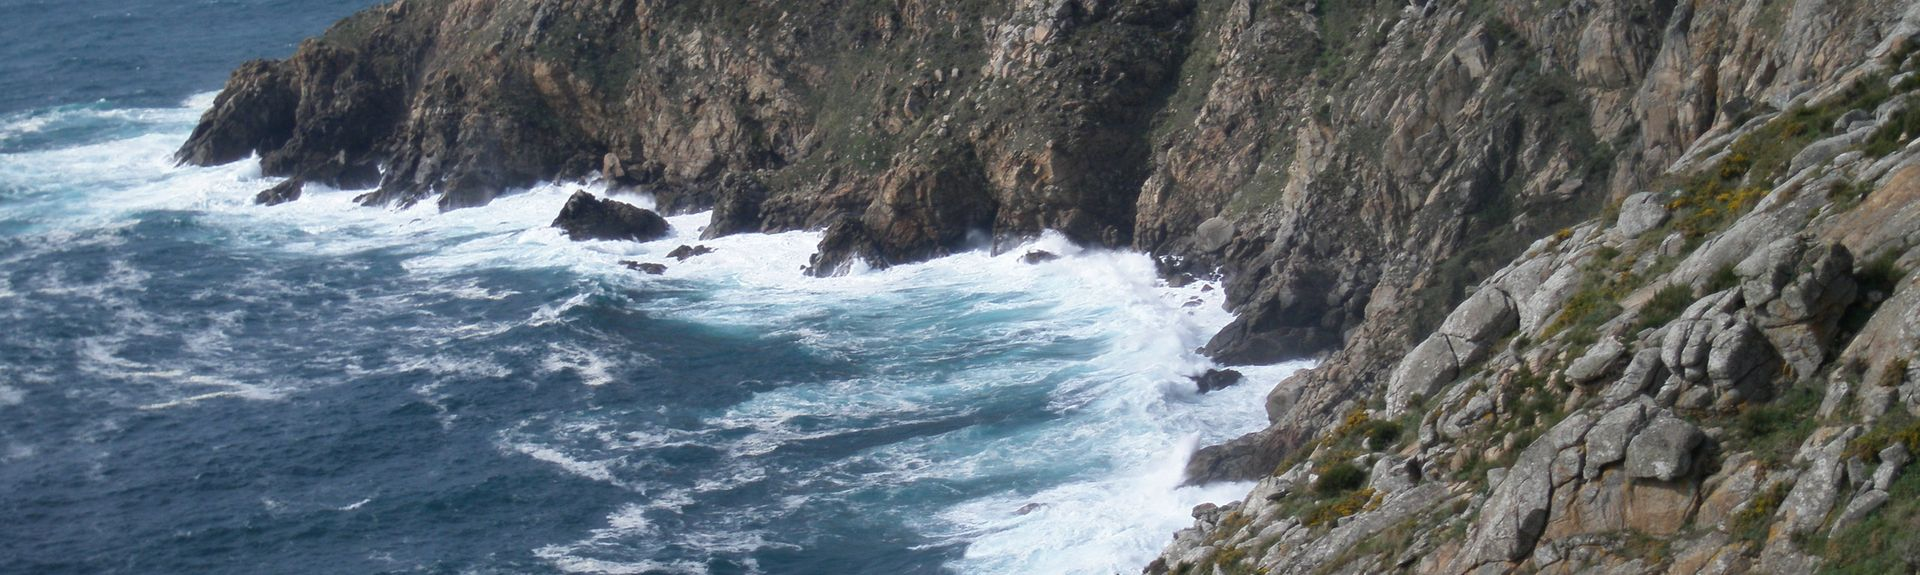 A Laracha, A Coruña, Spain